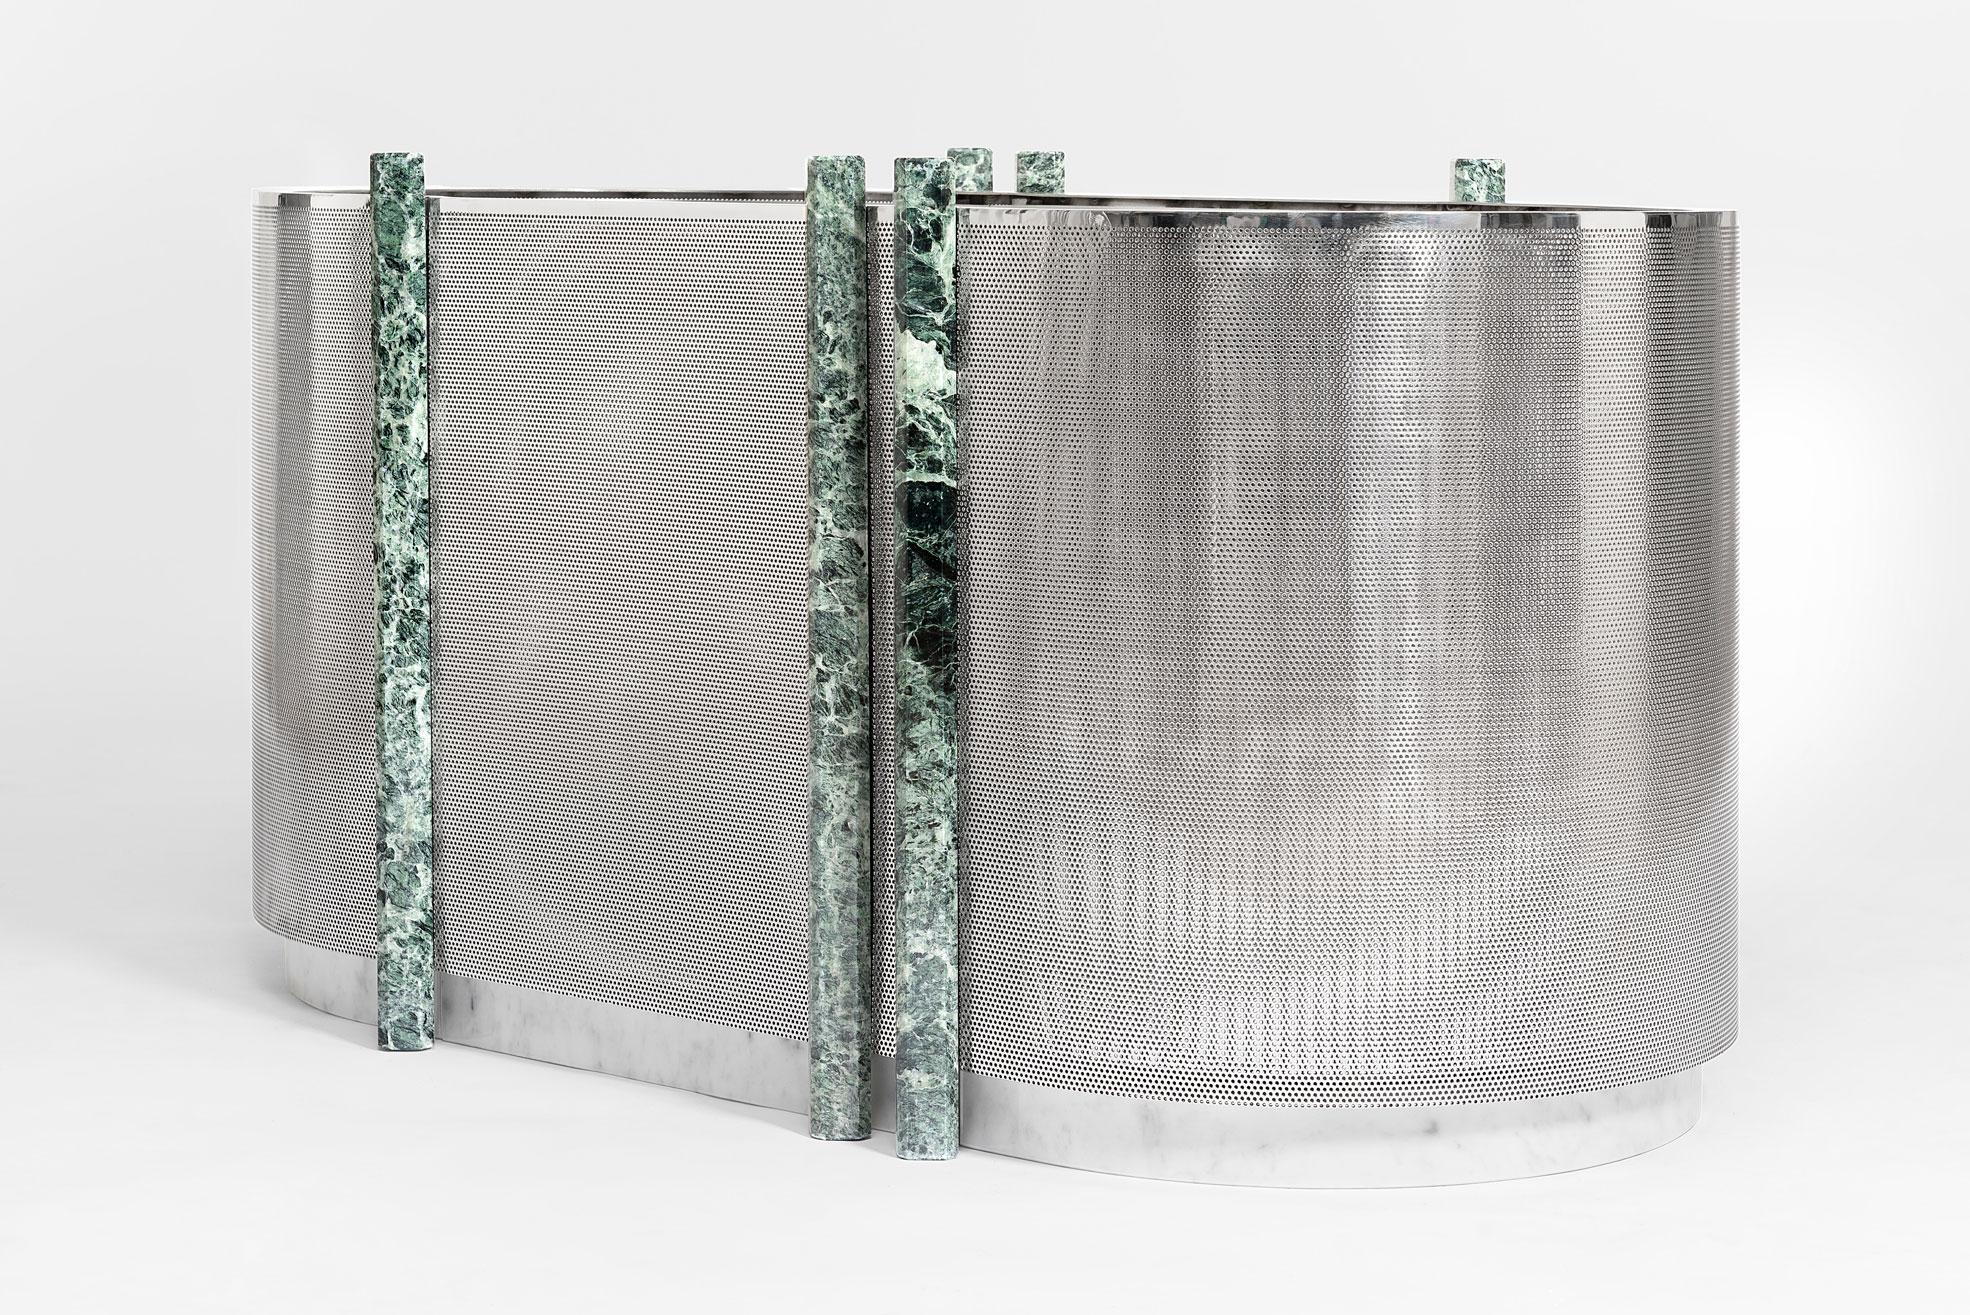 Metal Vase large size with green marble design by Derek Castiglioni Photographer Maria Teresa Furnari